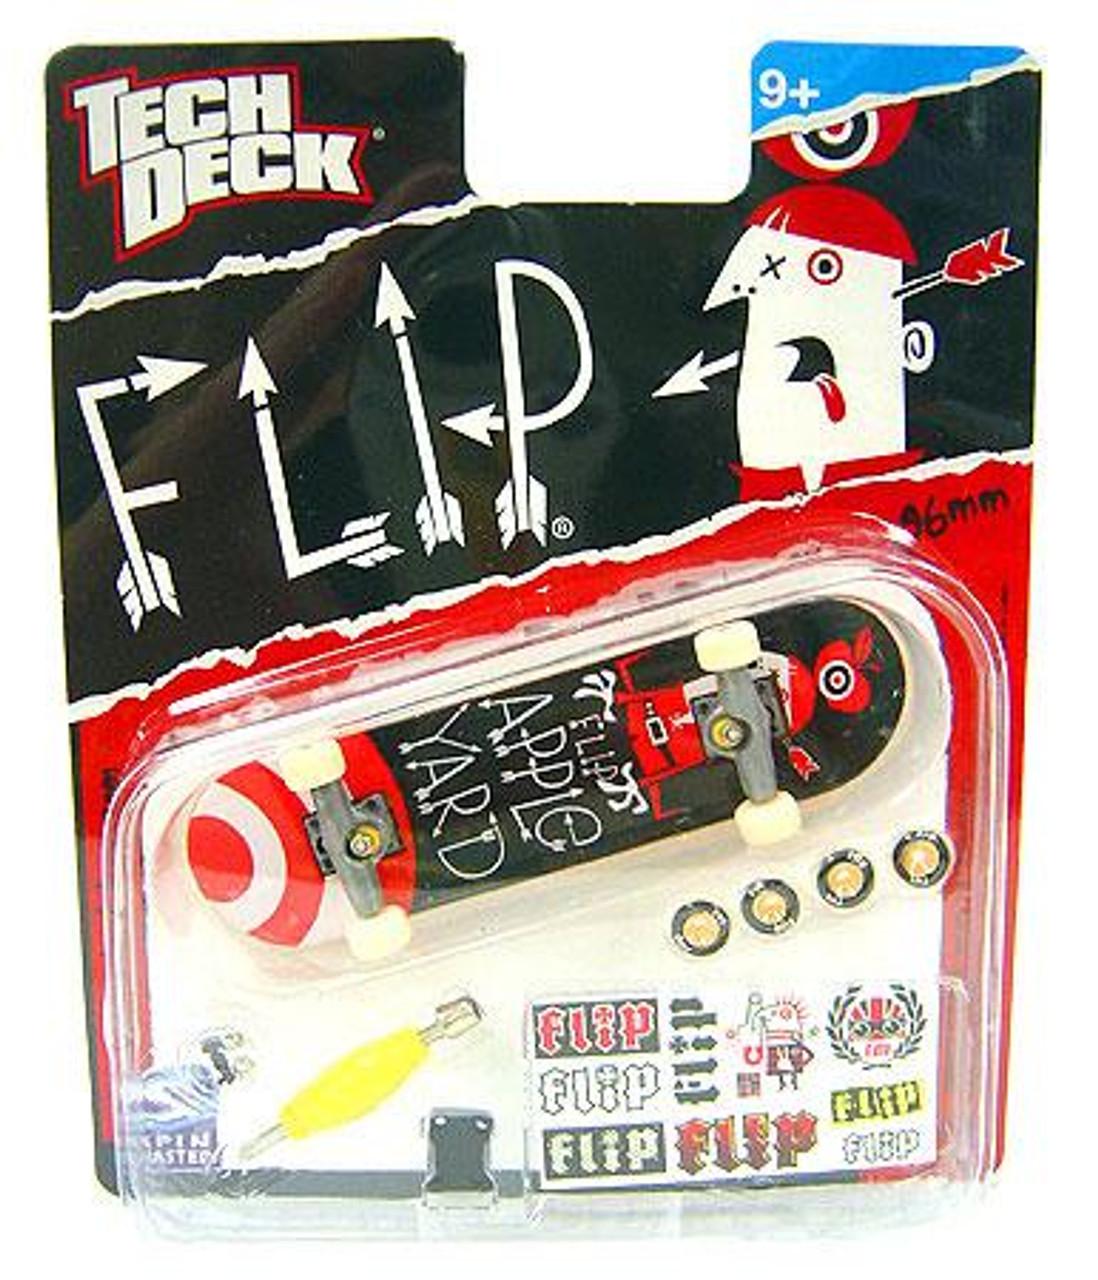 Tech Deck Flip 96mm Mini Skateboard [Mark Appleyard]